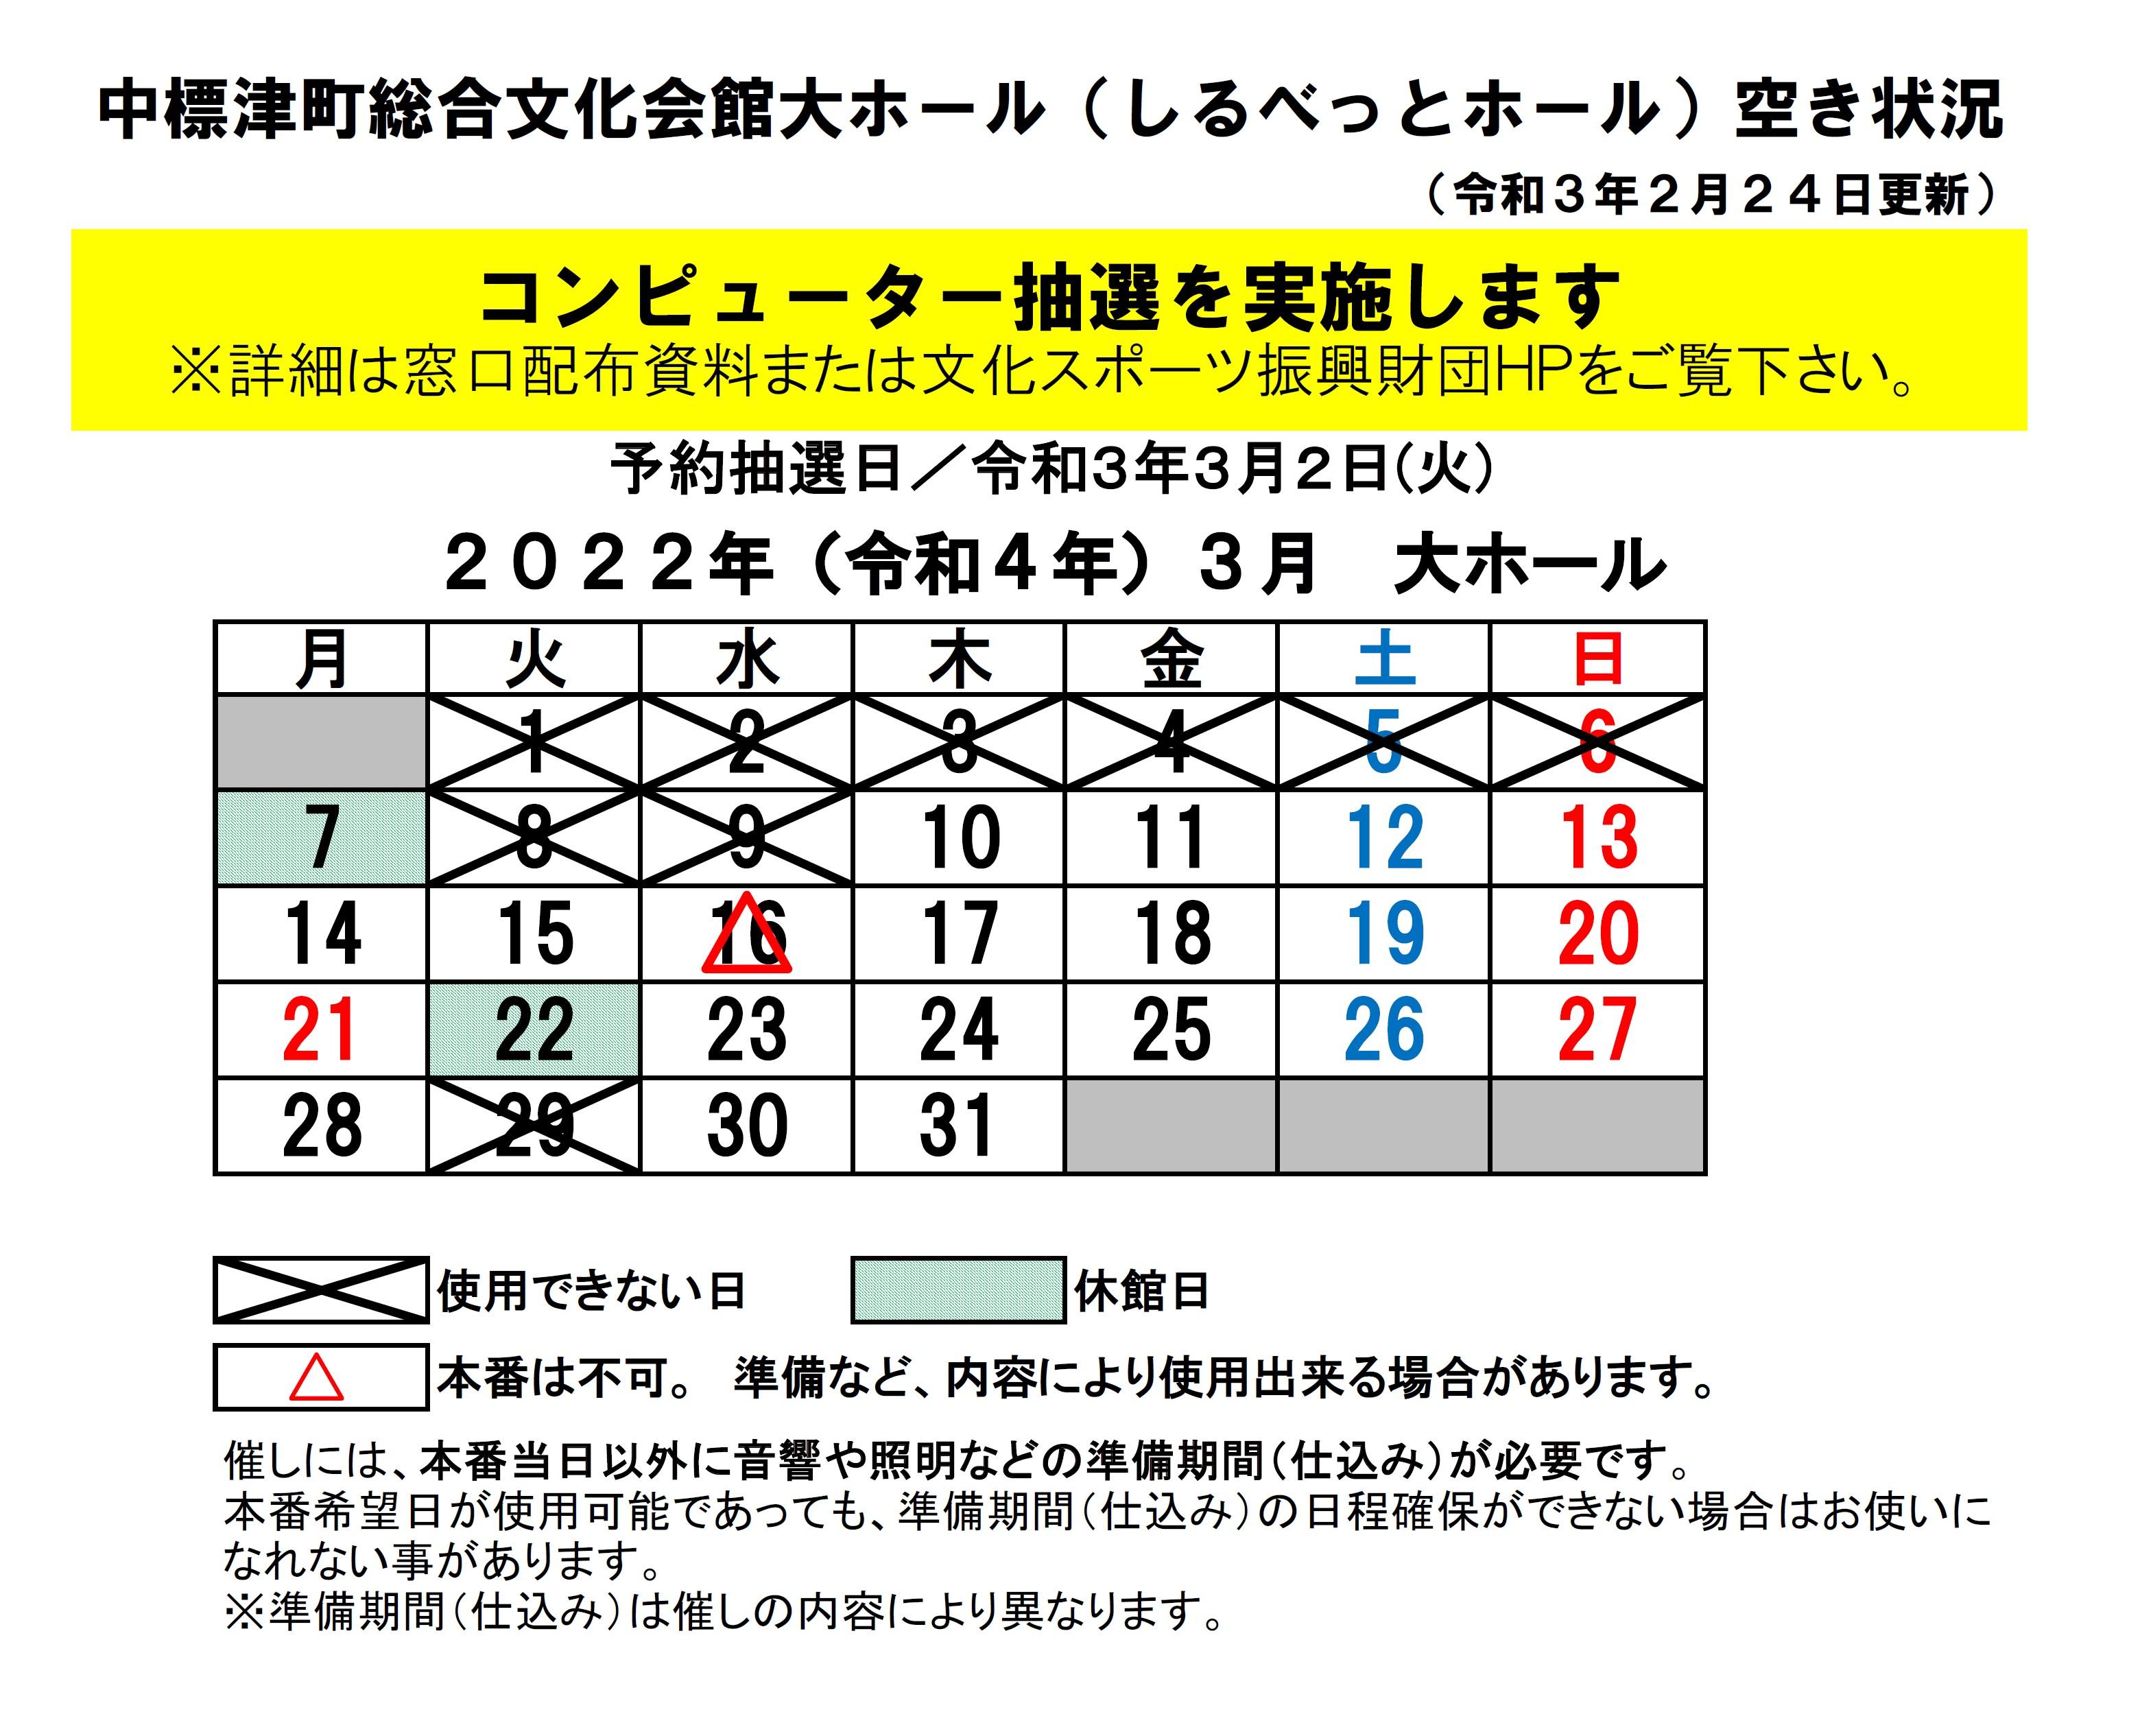 2022_94N3_8C_8E_8B_F3_82_AB_8F_F3_8B_B5.jpg